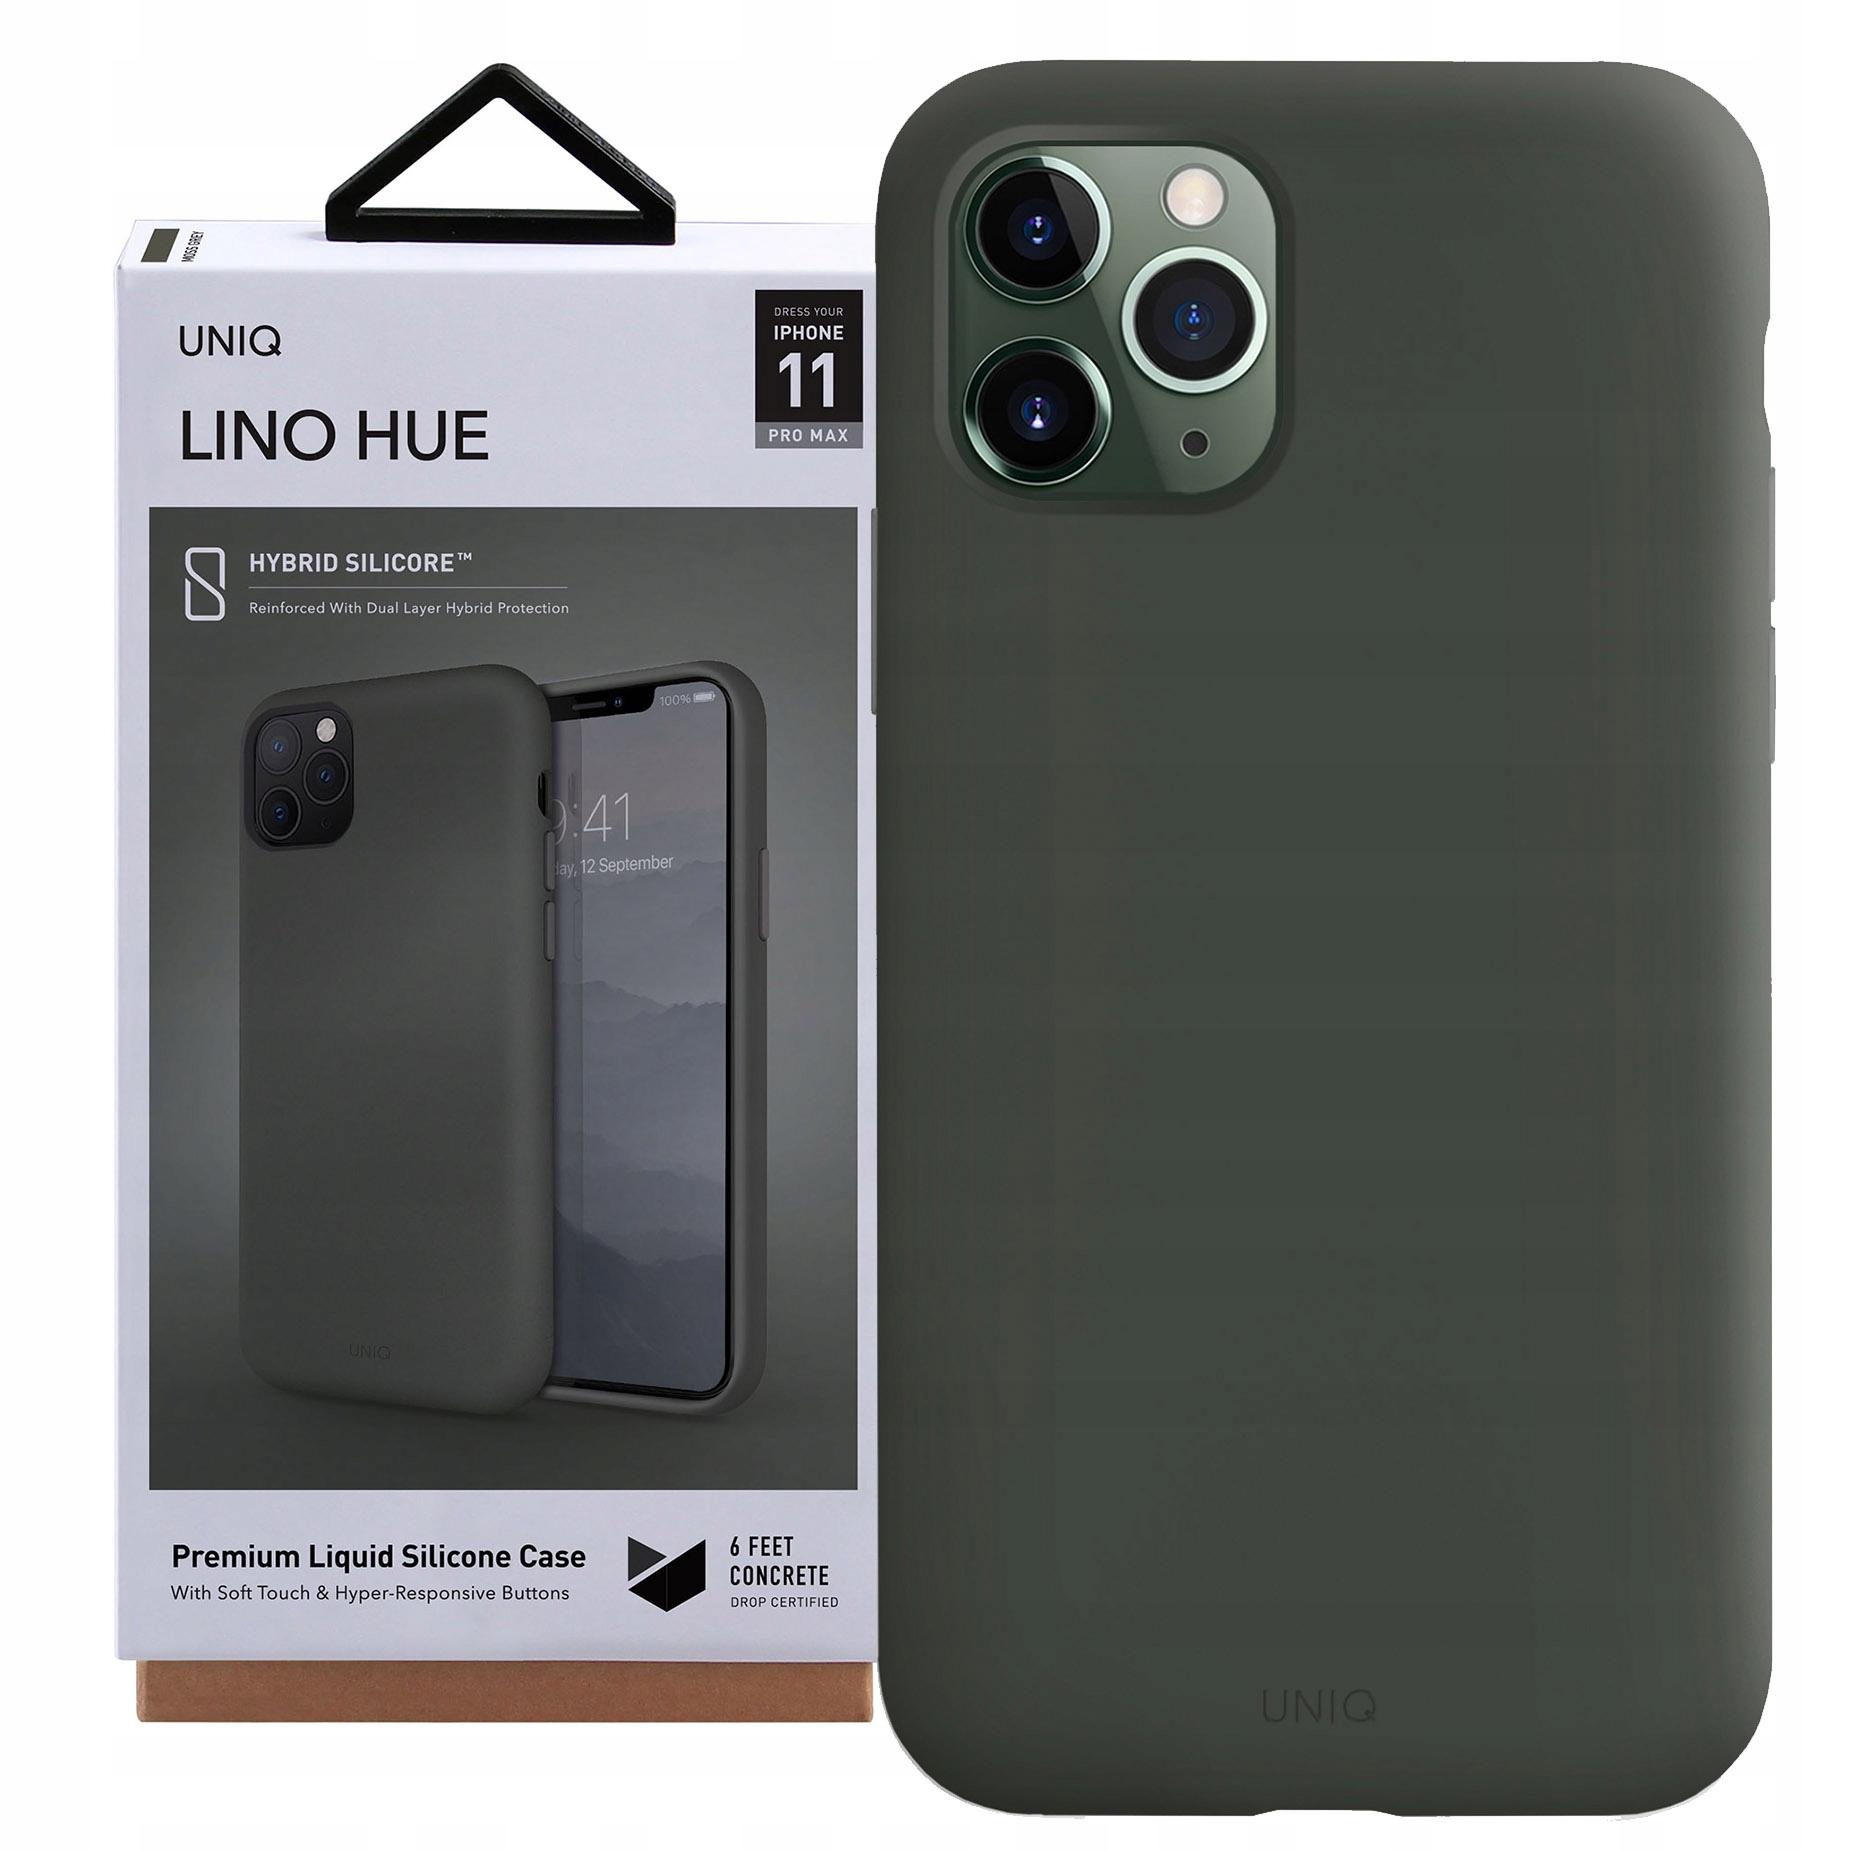 Etui Uniq do iPhone 11 Pro Max, case pokrowiec, Lh